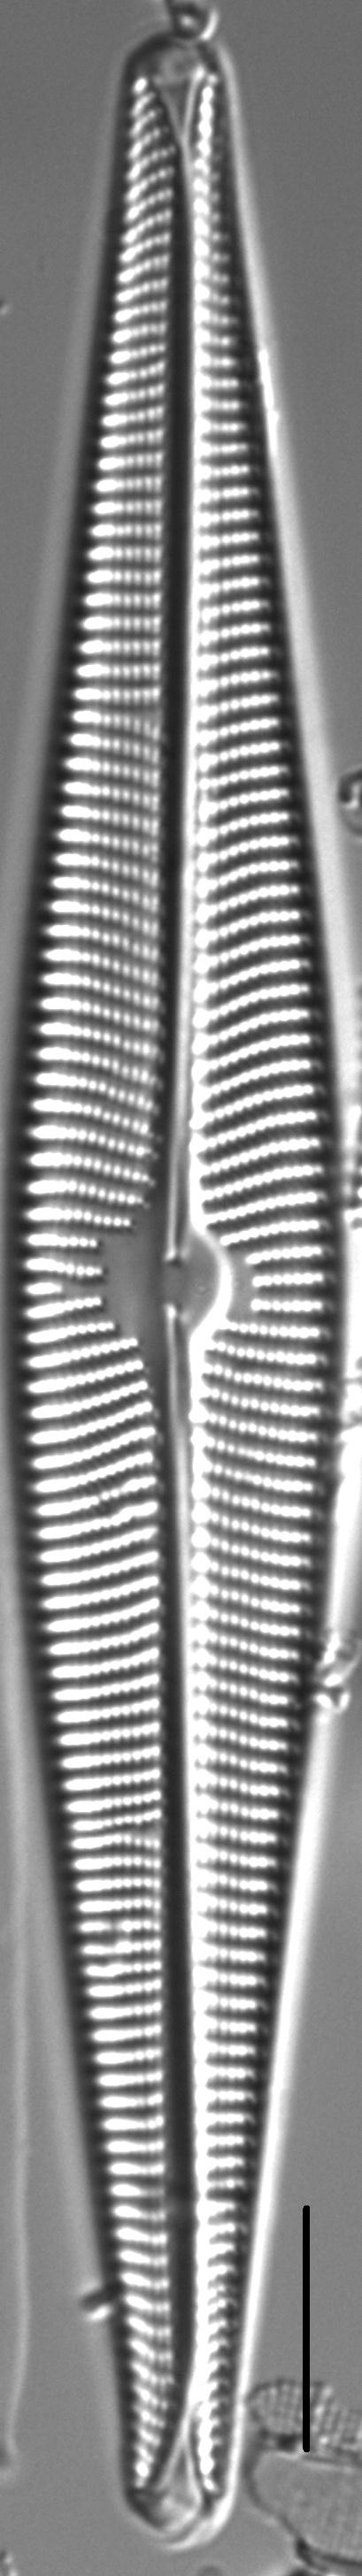 Navicula galloae LM2